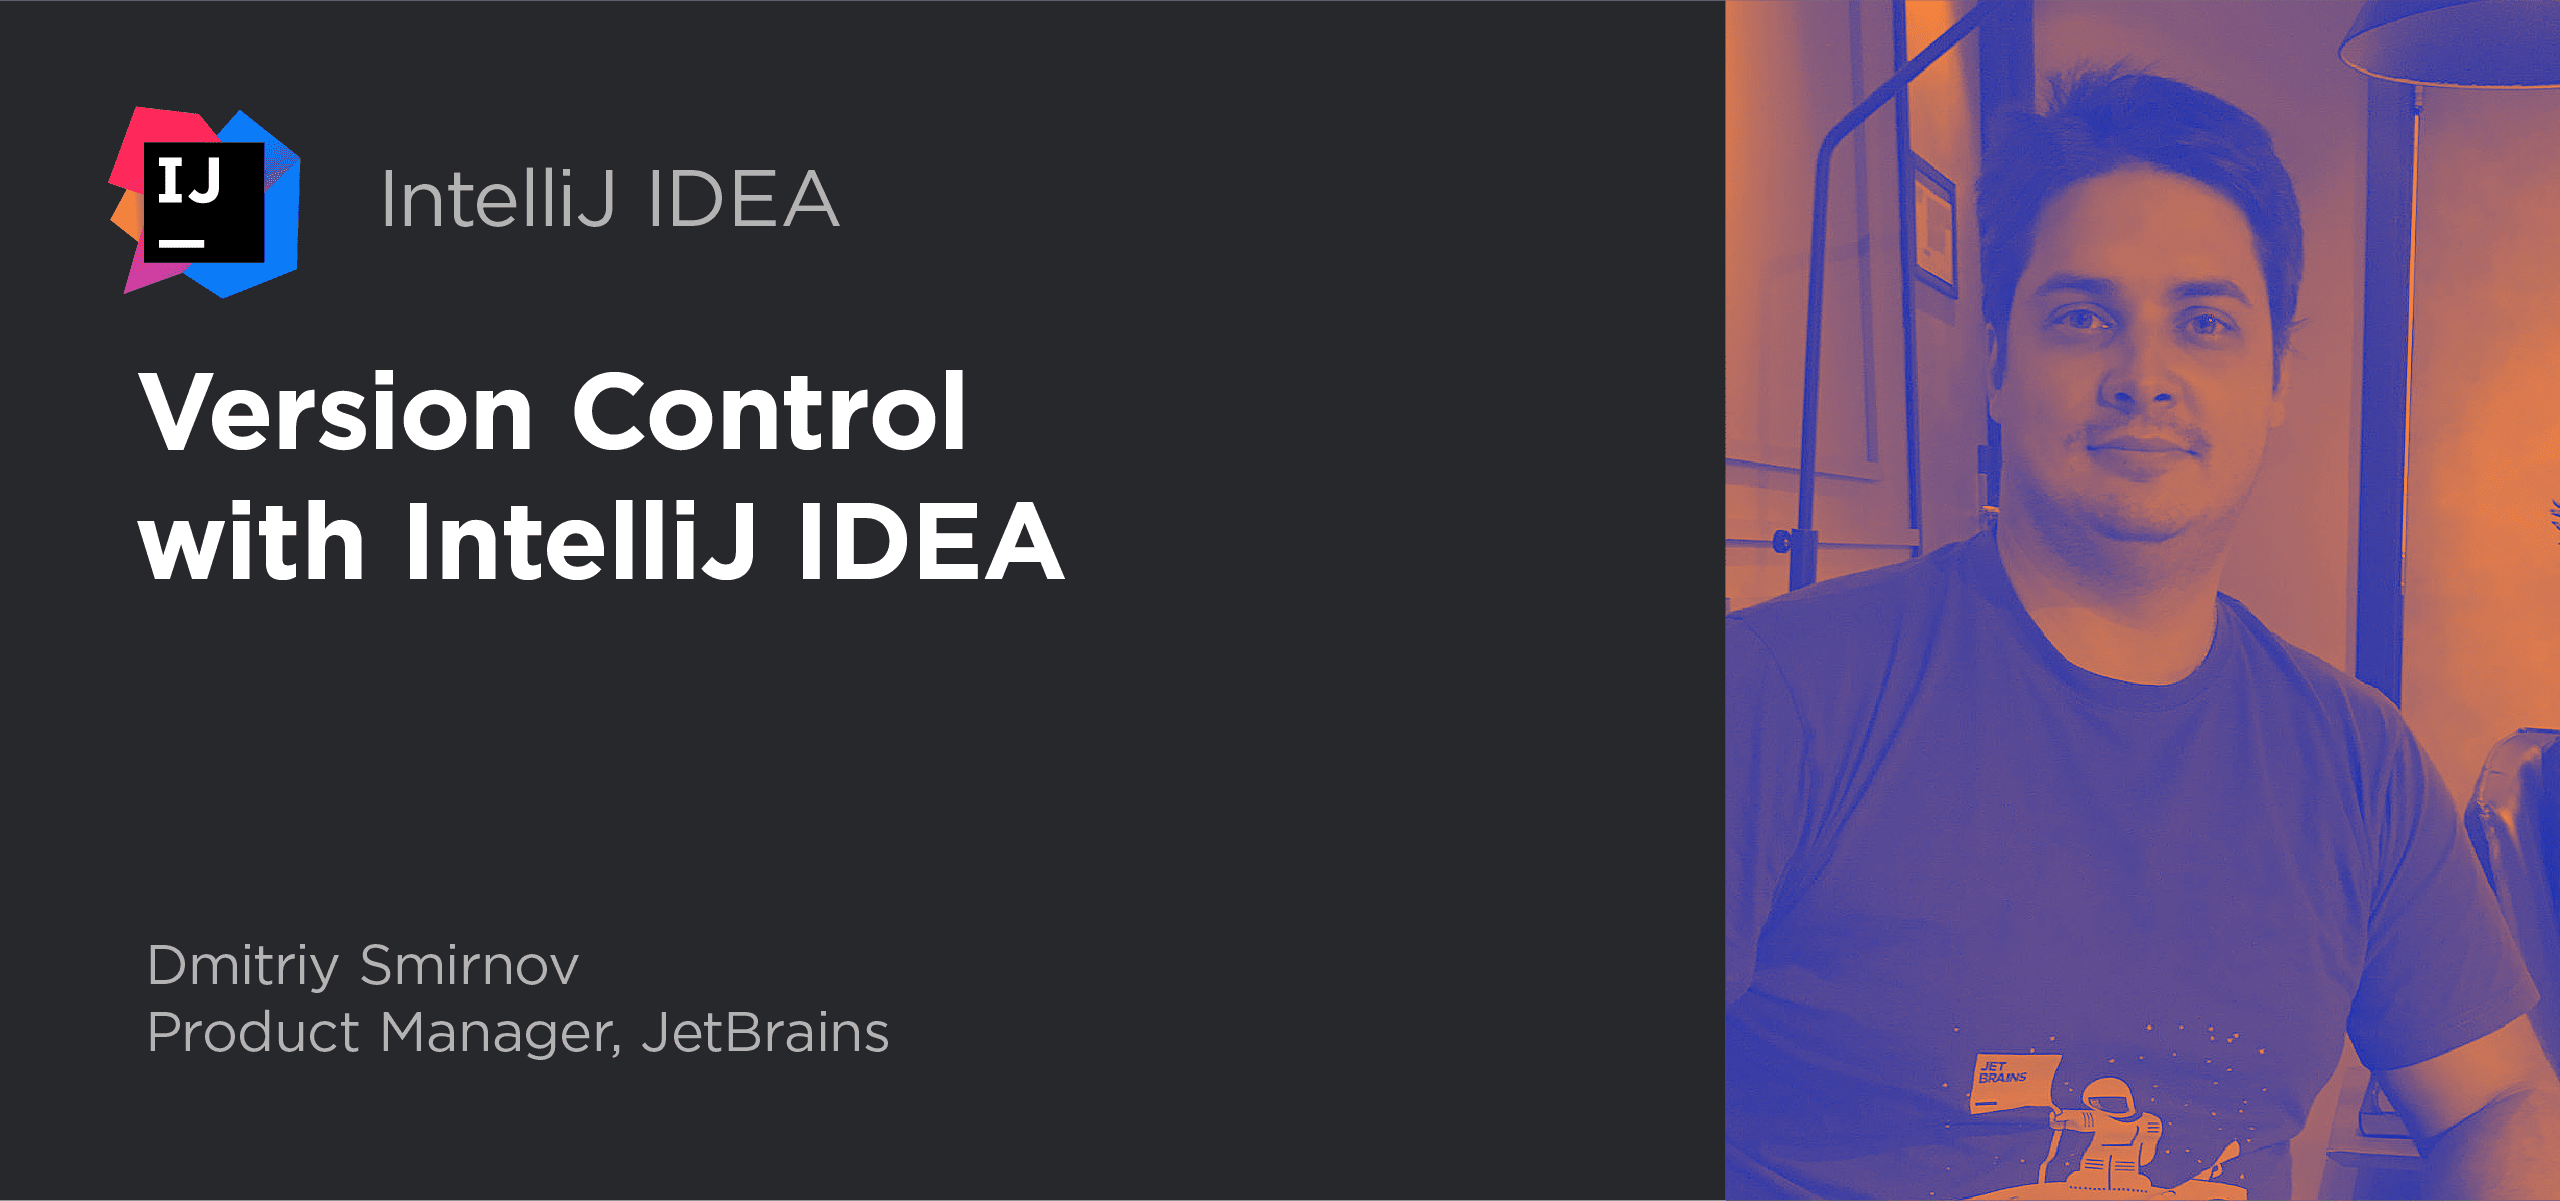 Version Control with IntelliJ IDEA